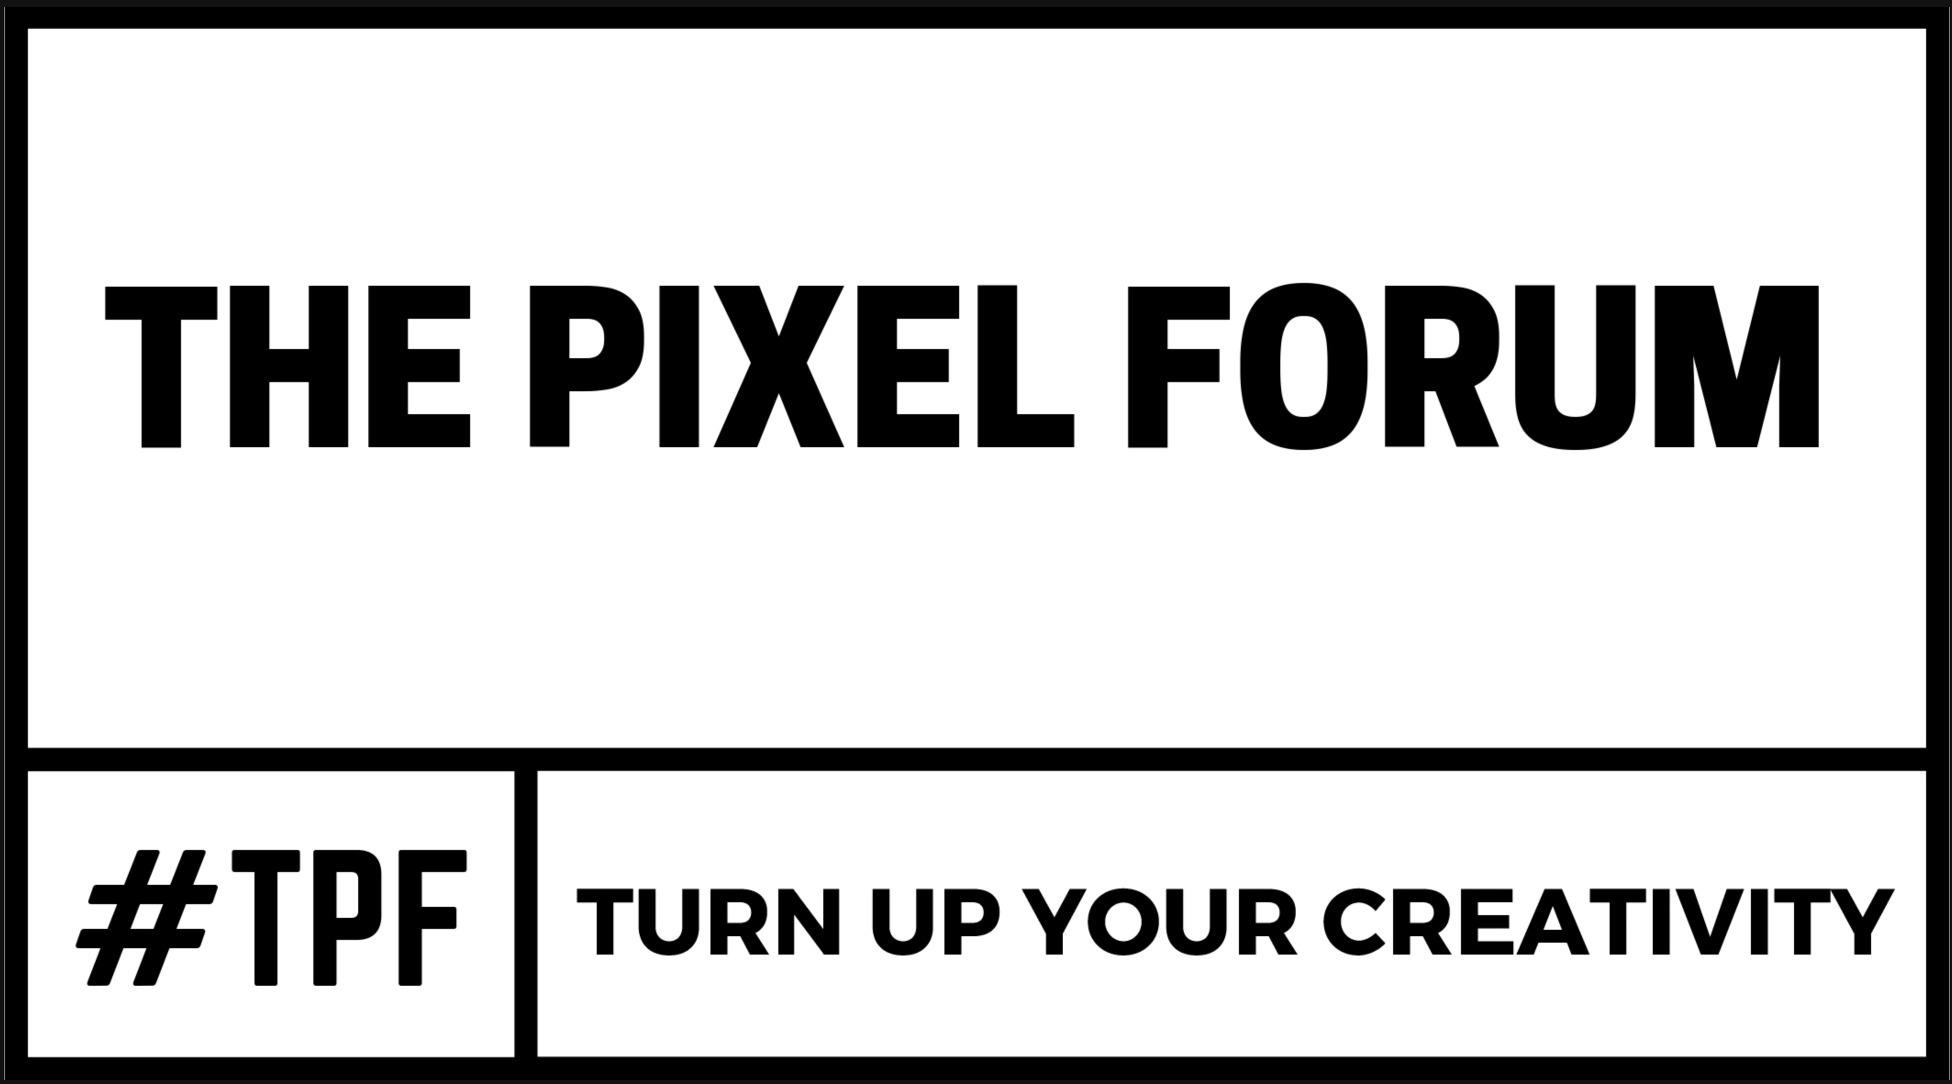 @thepixelforum Cover Image